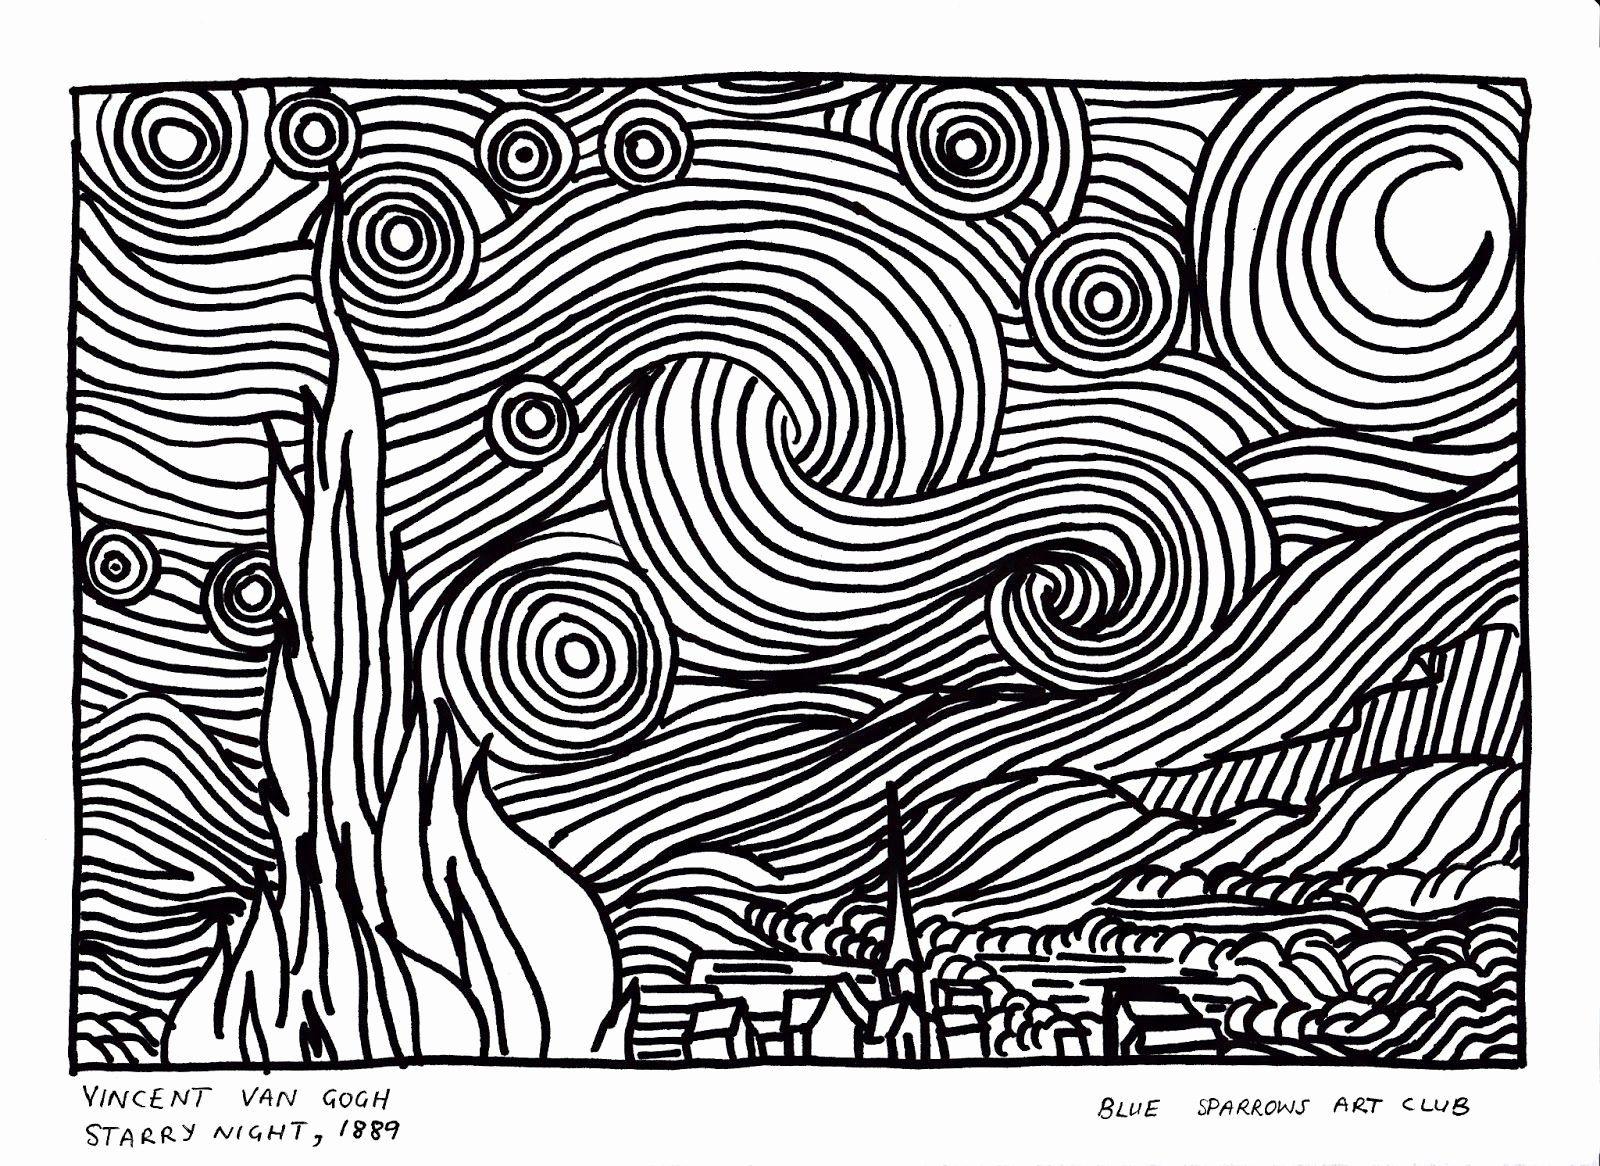 Starry Night Coloring Page Elegant Van Gogh Starry Night Coloring Page Vincent Van Gogh In 2020 Van Gogh Coloring Starry Night Van Gogh Vincent Van Gogh Art